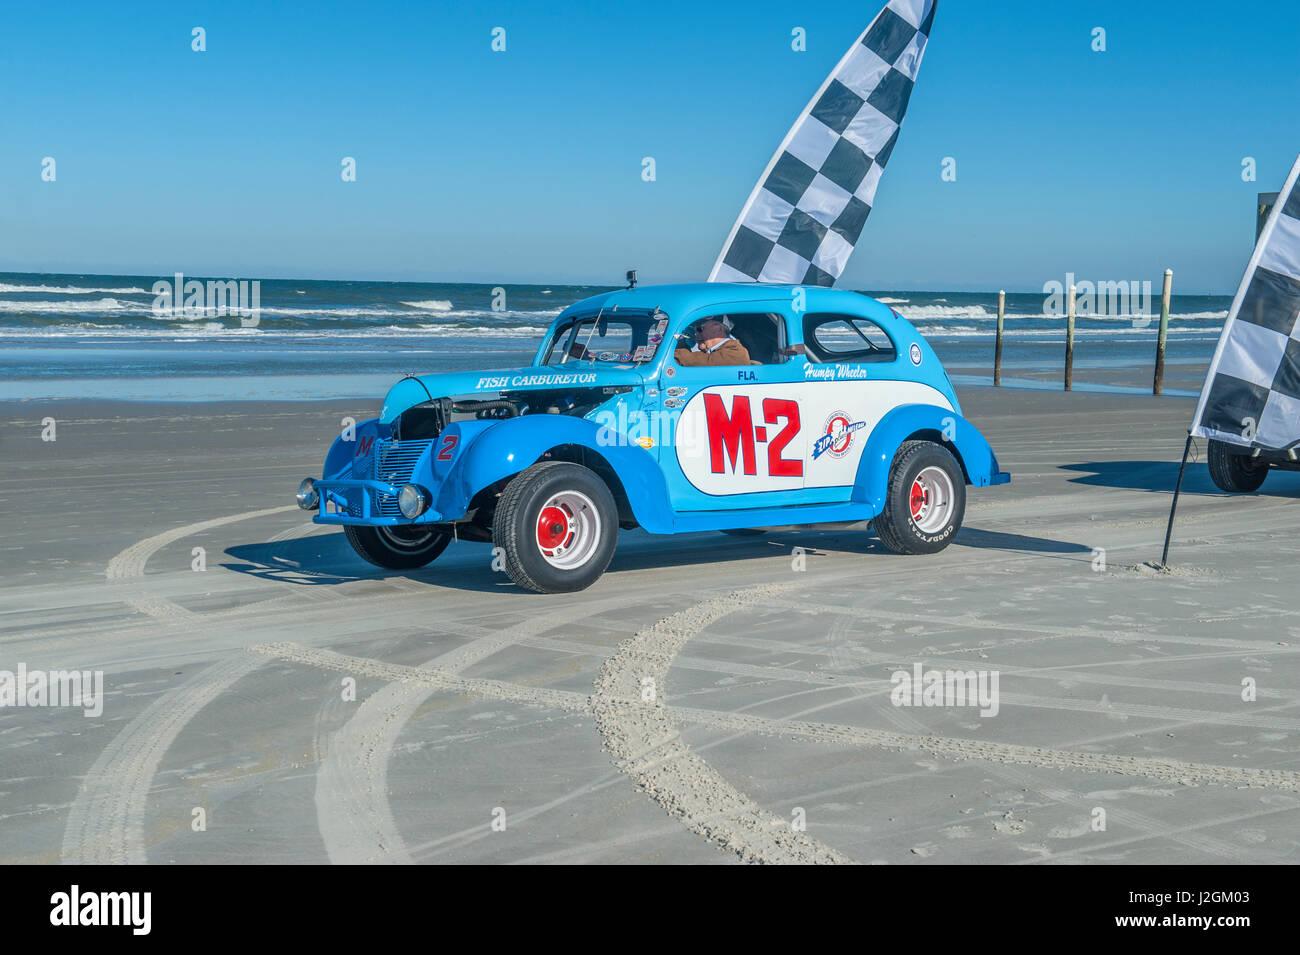 Antique NASCAR car, North Turn, Ponce Inlet, Florida, USA - Stock Image